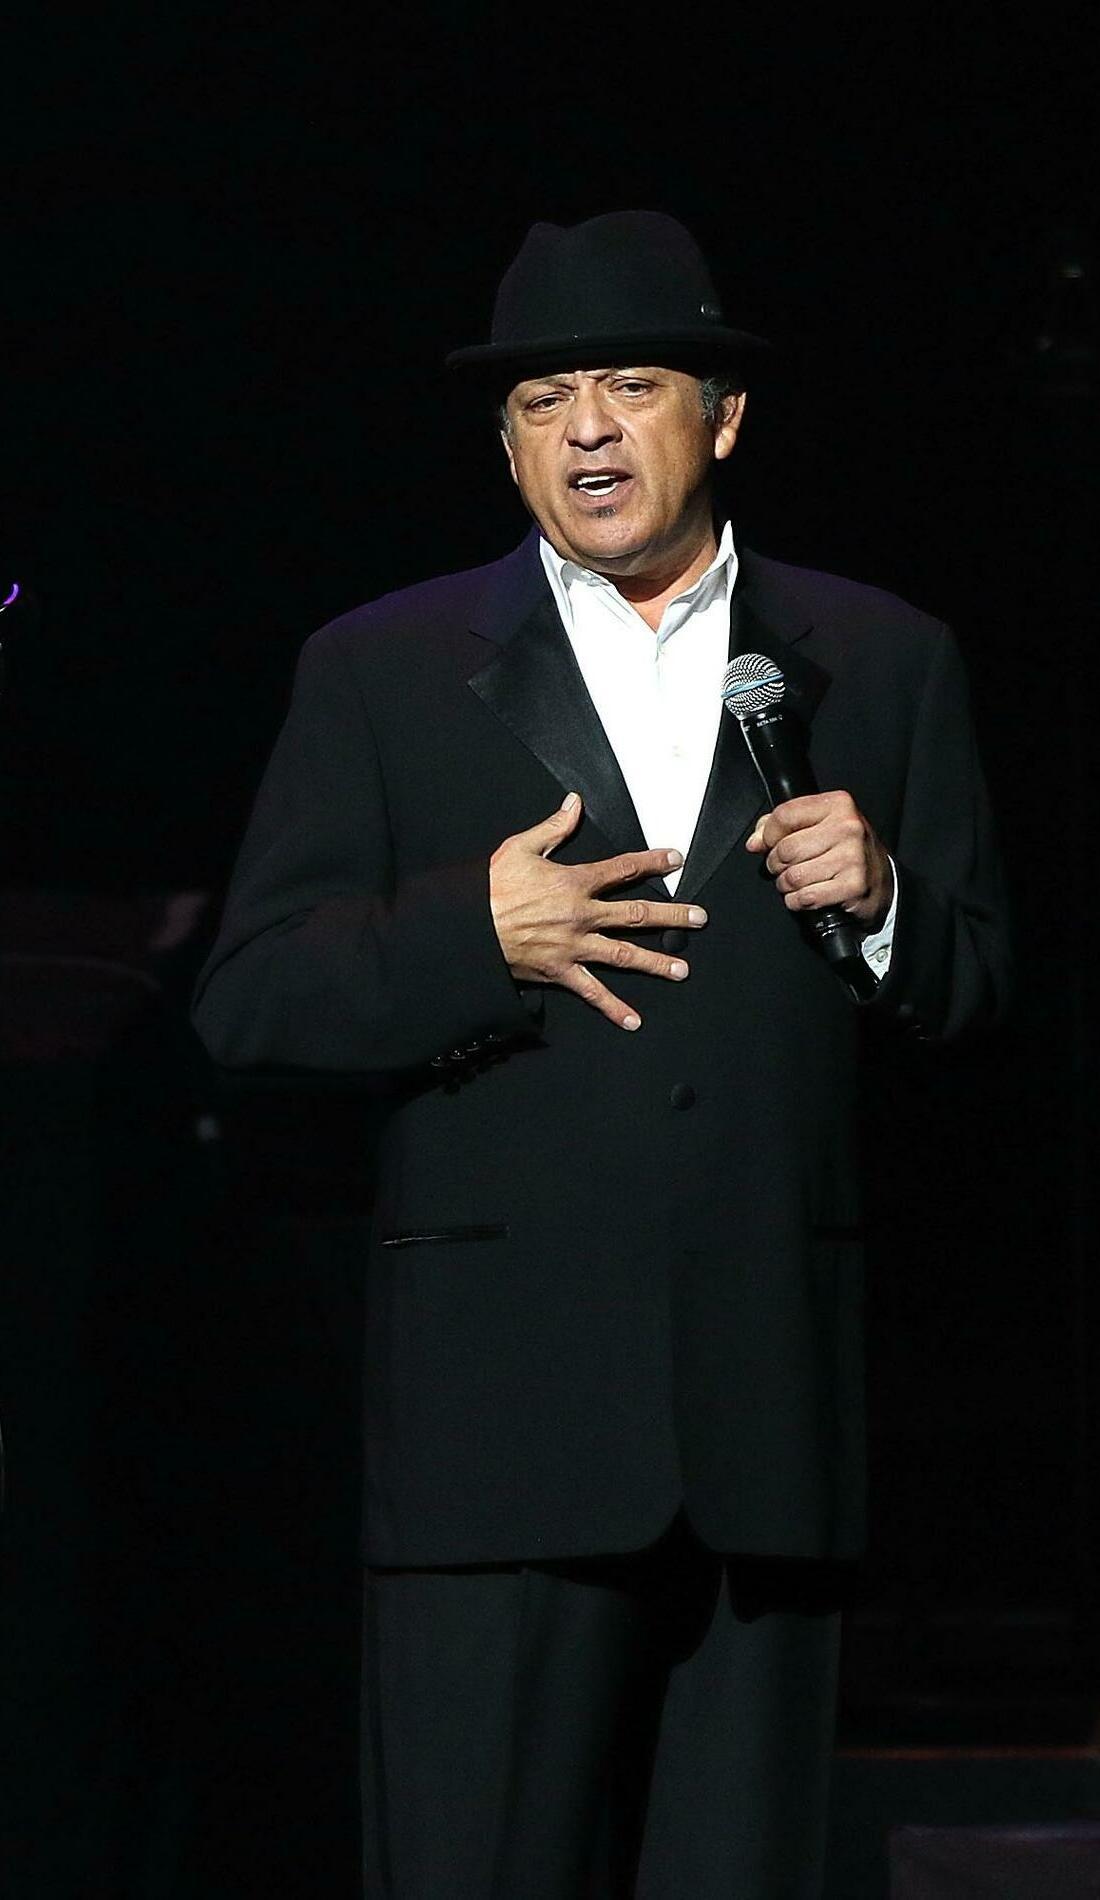 A Paul Rodriguez live event